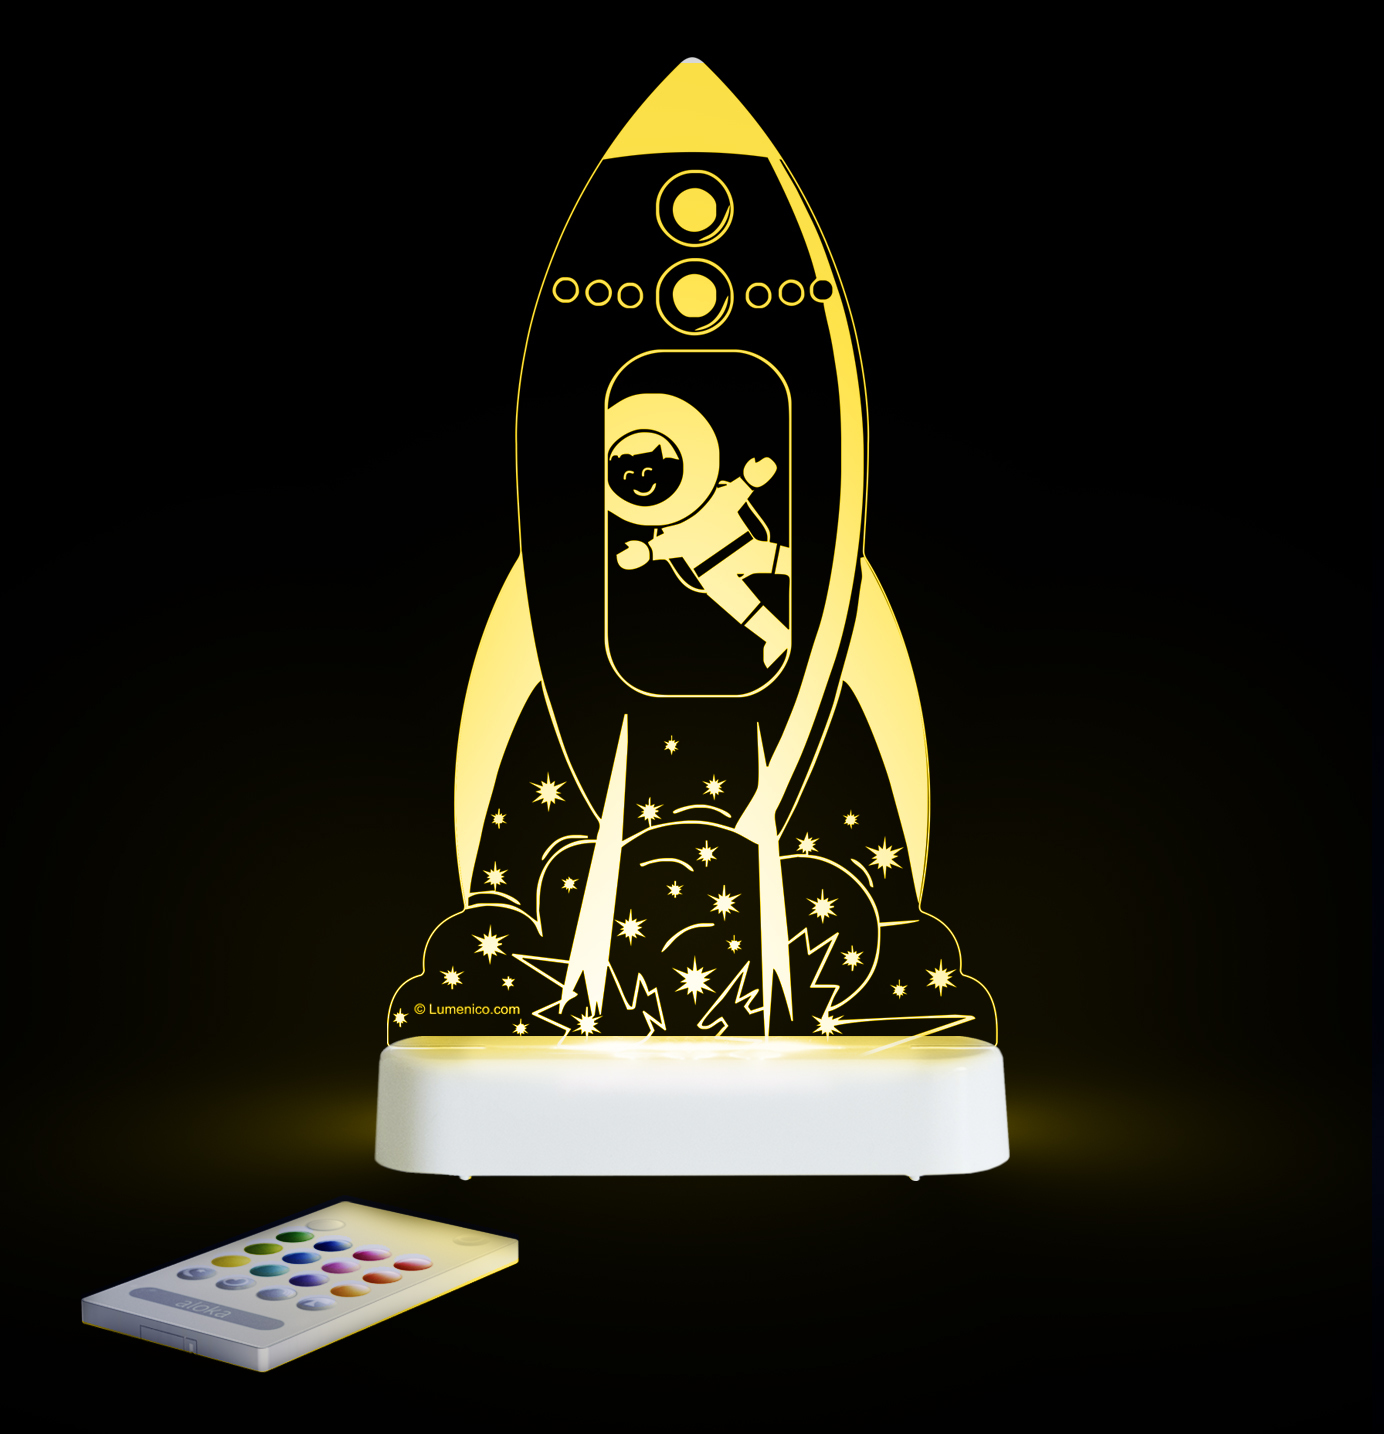 Aloka: Night Light - Rocket image